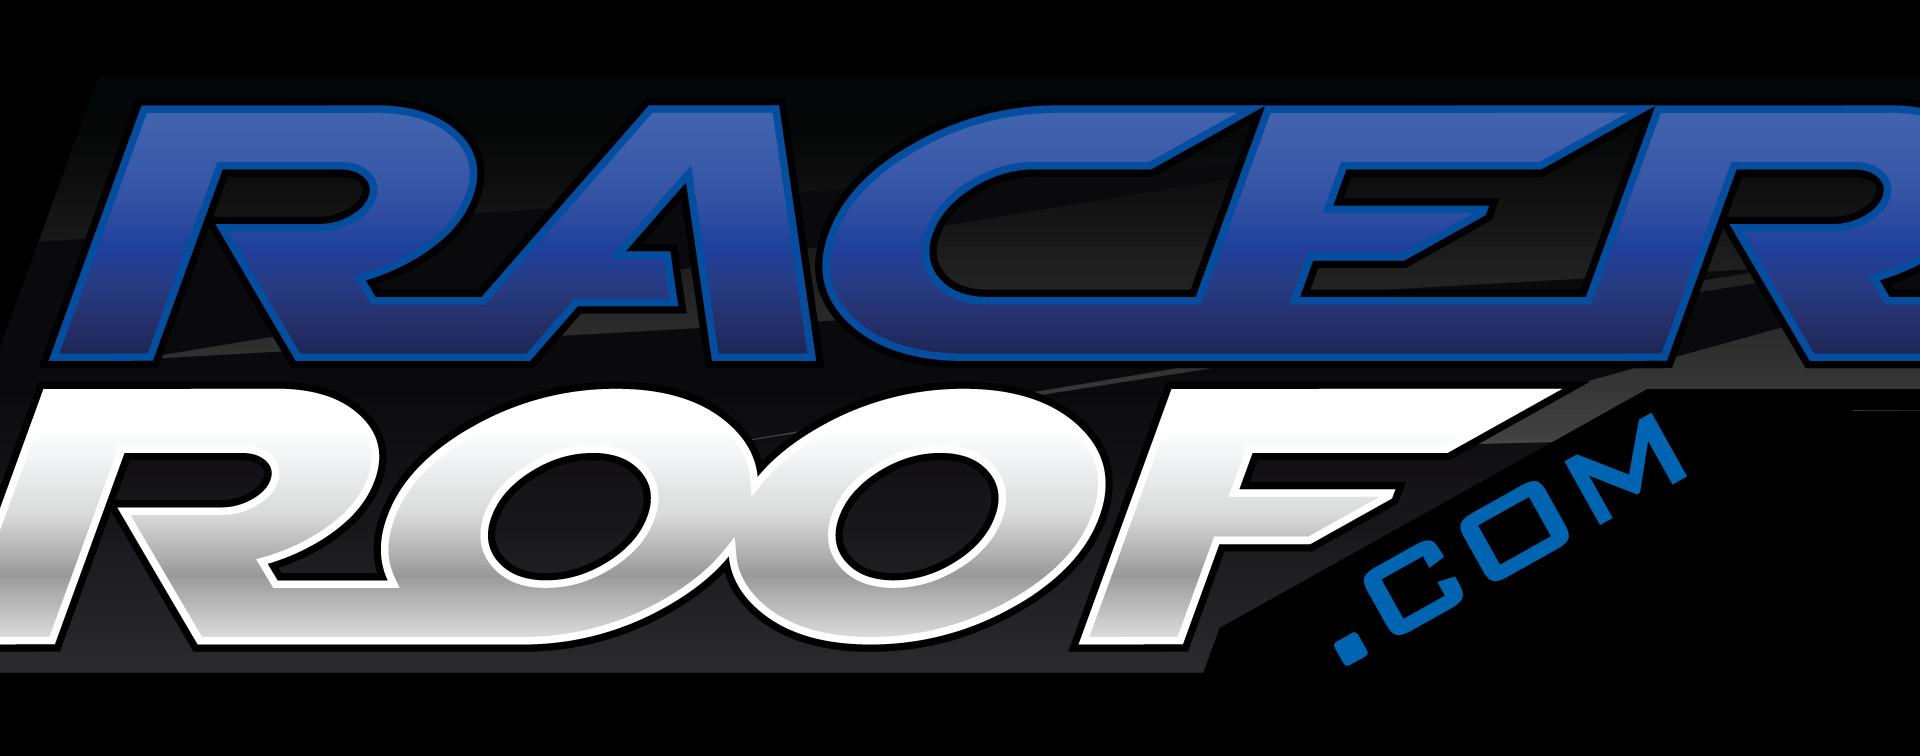 RacerRoof-Logo.png